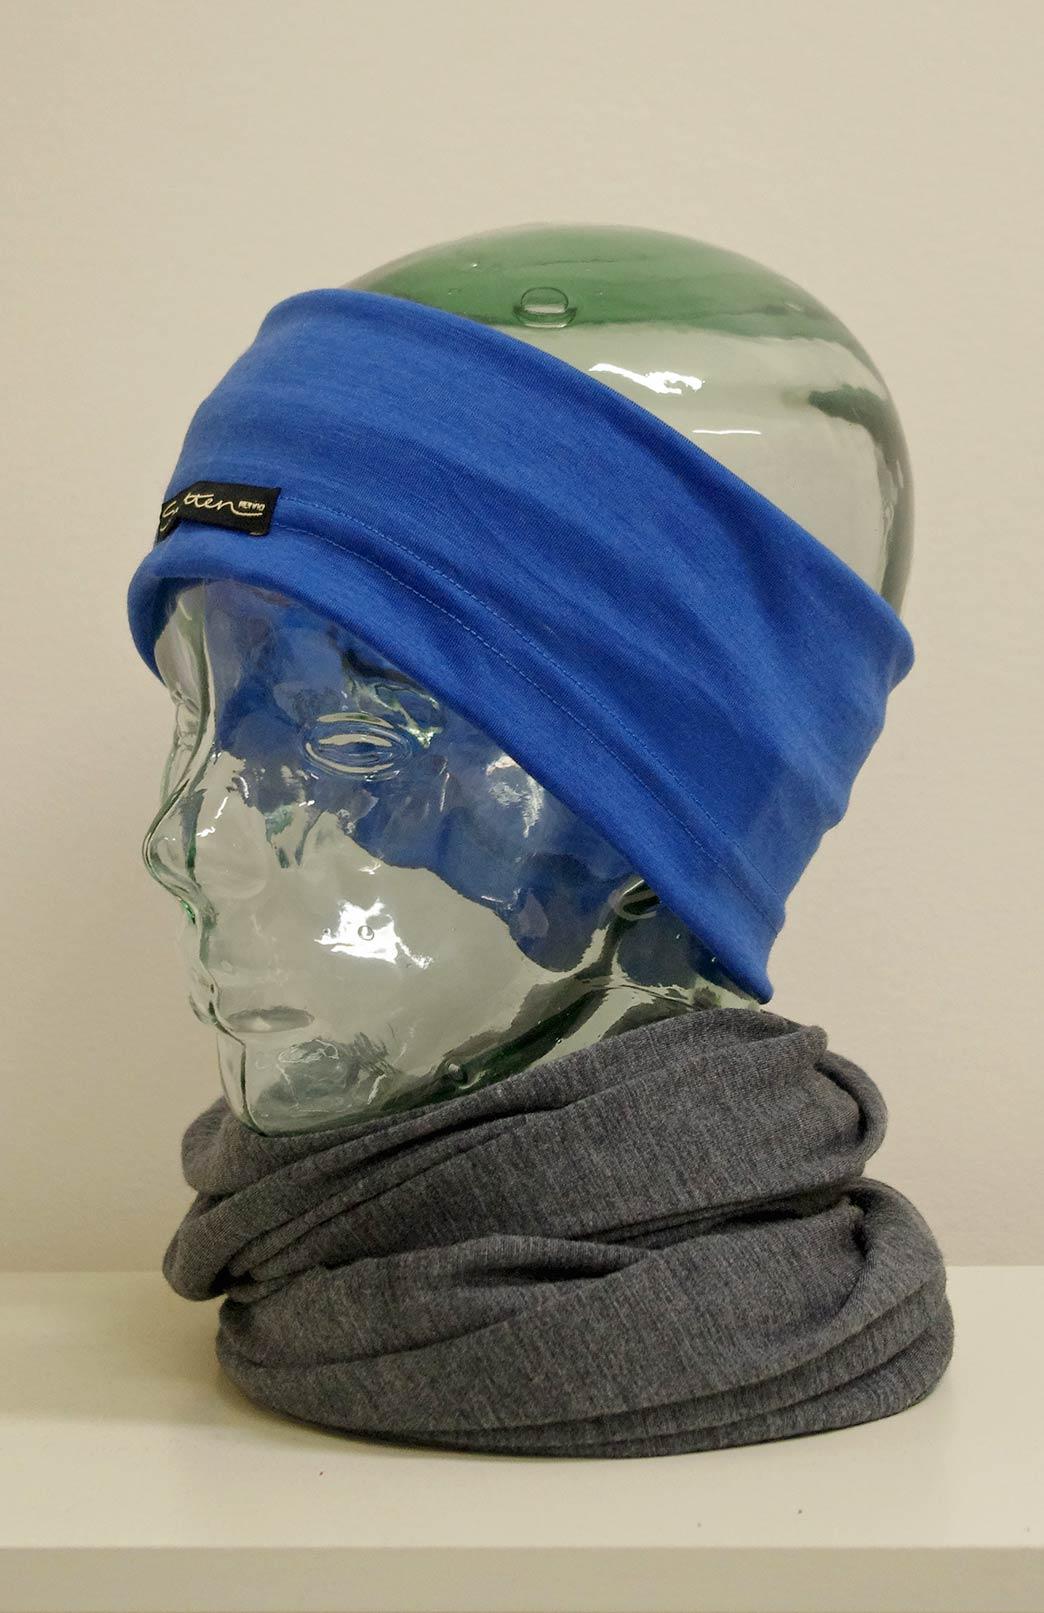 Headband / Ear Warmer - Unisex Electric Blue Merino Wool Headband and Ear Warmer - Smitten Merino Tasmania Australia